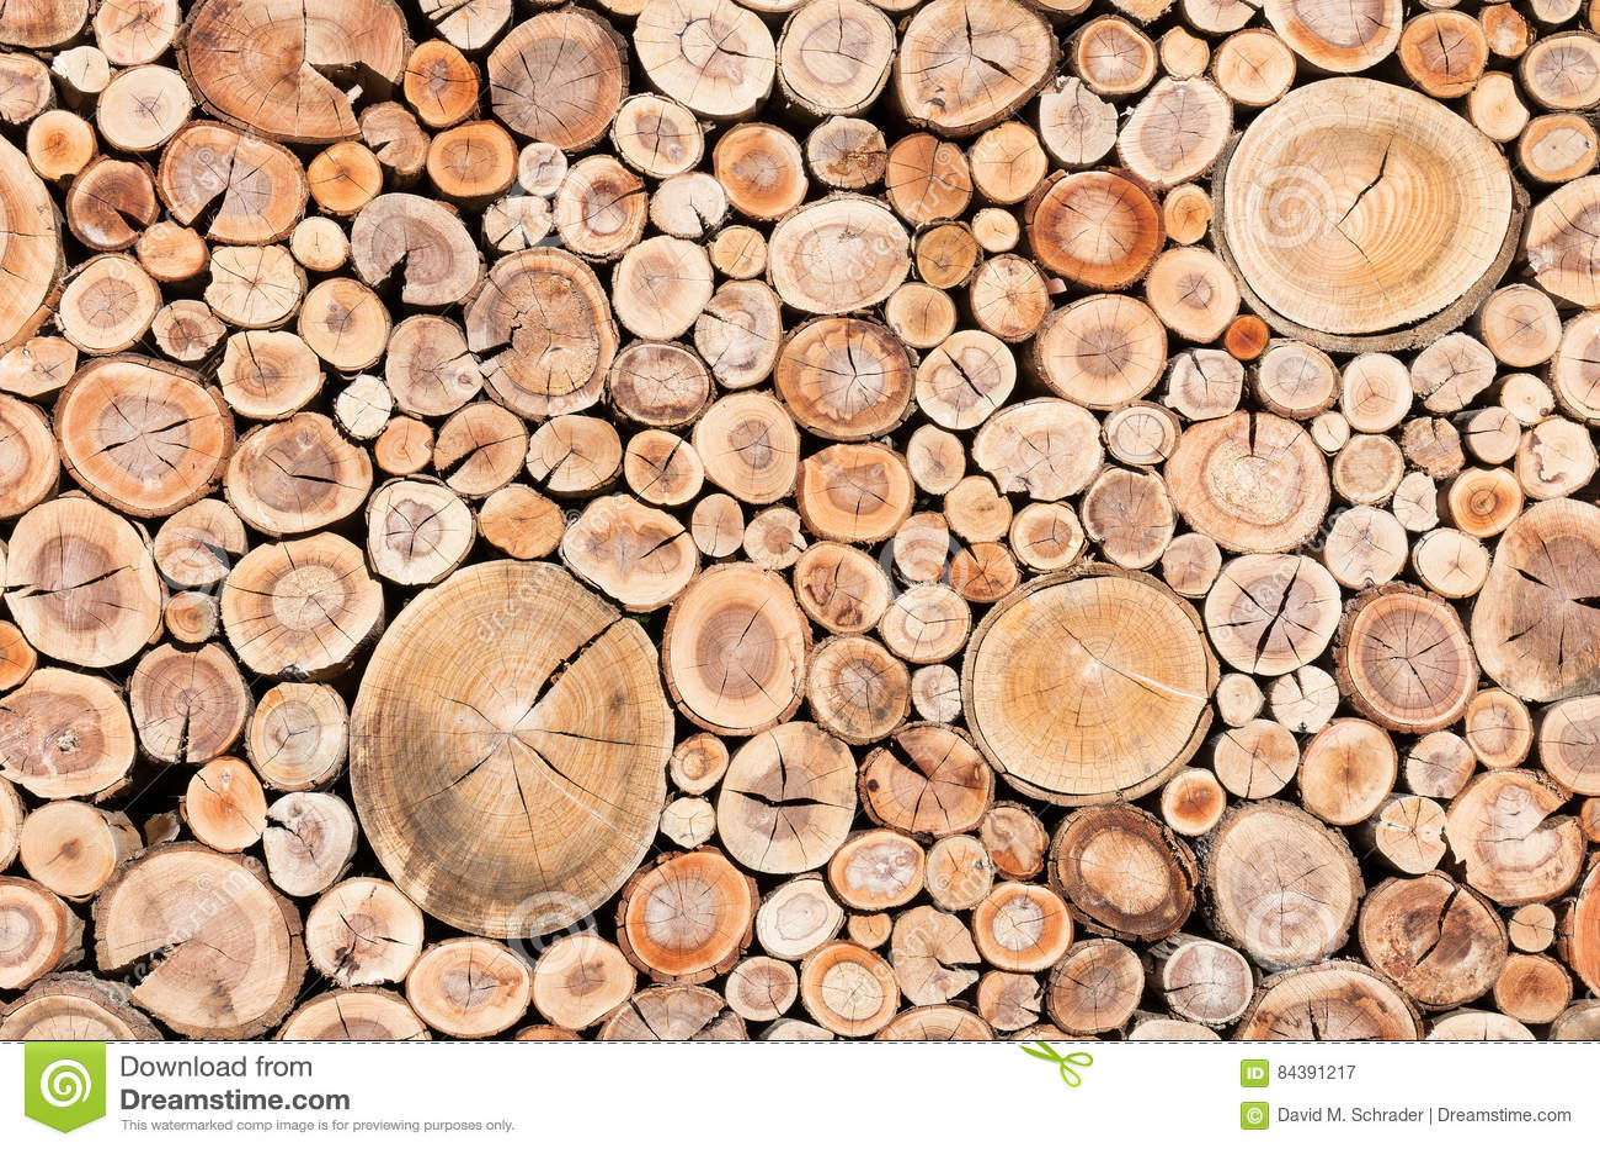 barri re en bois de corde image stock image du logs 84391217. Black Bedroom Furniture Sets. Home Design Ideas